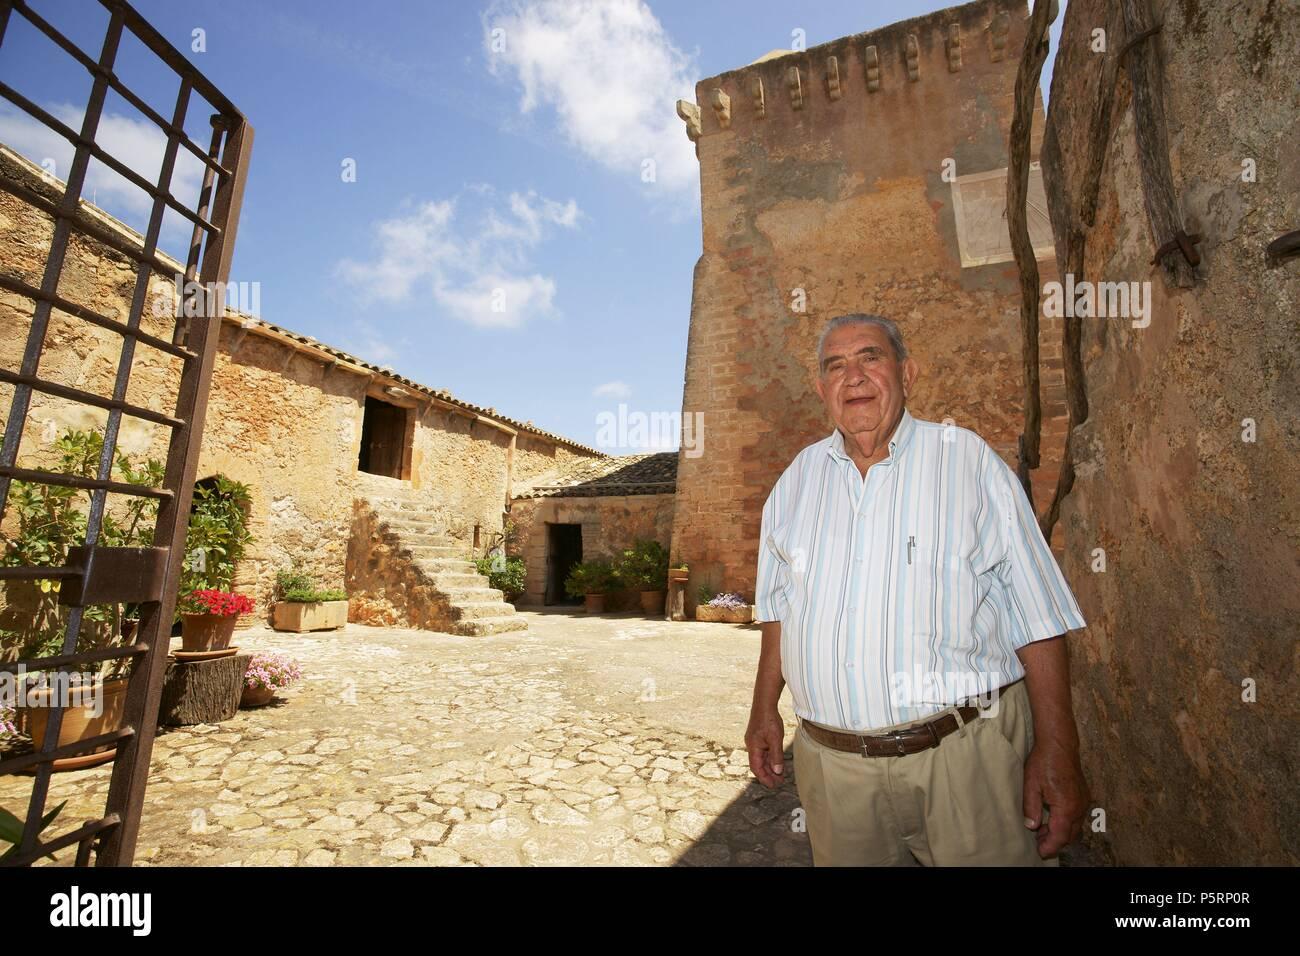 Joan Grimalt . Casa fortificada de Son Forteza. Sant Llorenç des Cardassar.Mallorca.Islas Baleares. España. - Stock Image